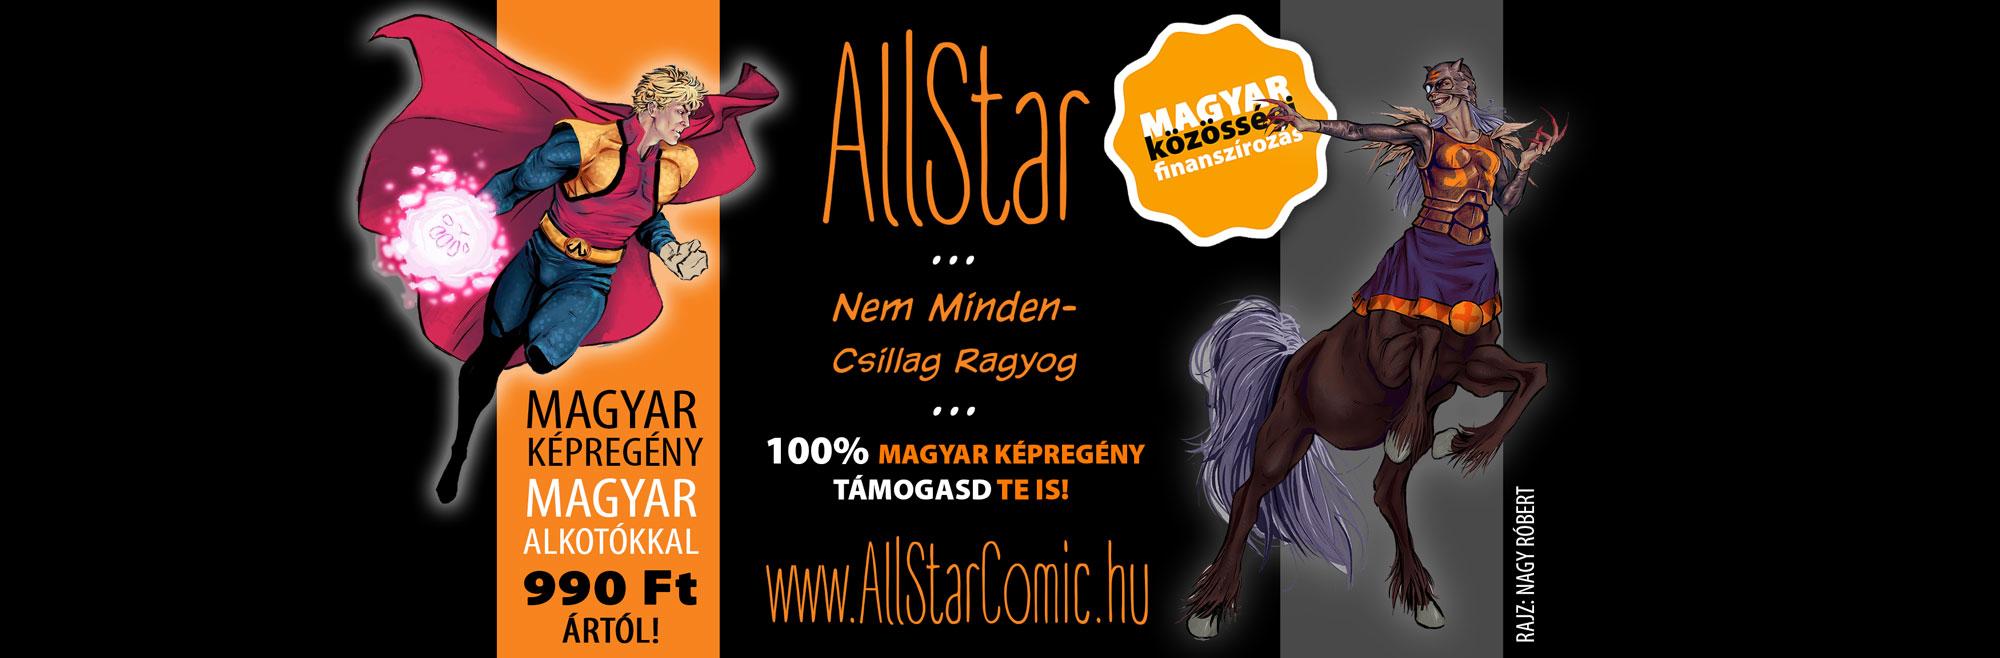 AllStar: Nem MindenCsillag Ragyog